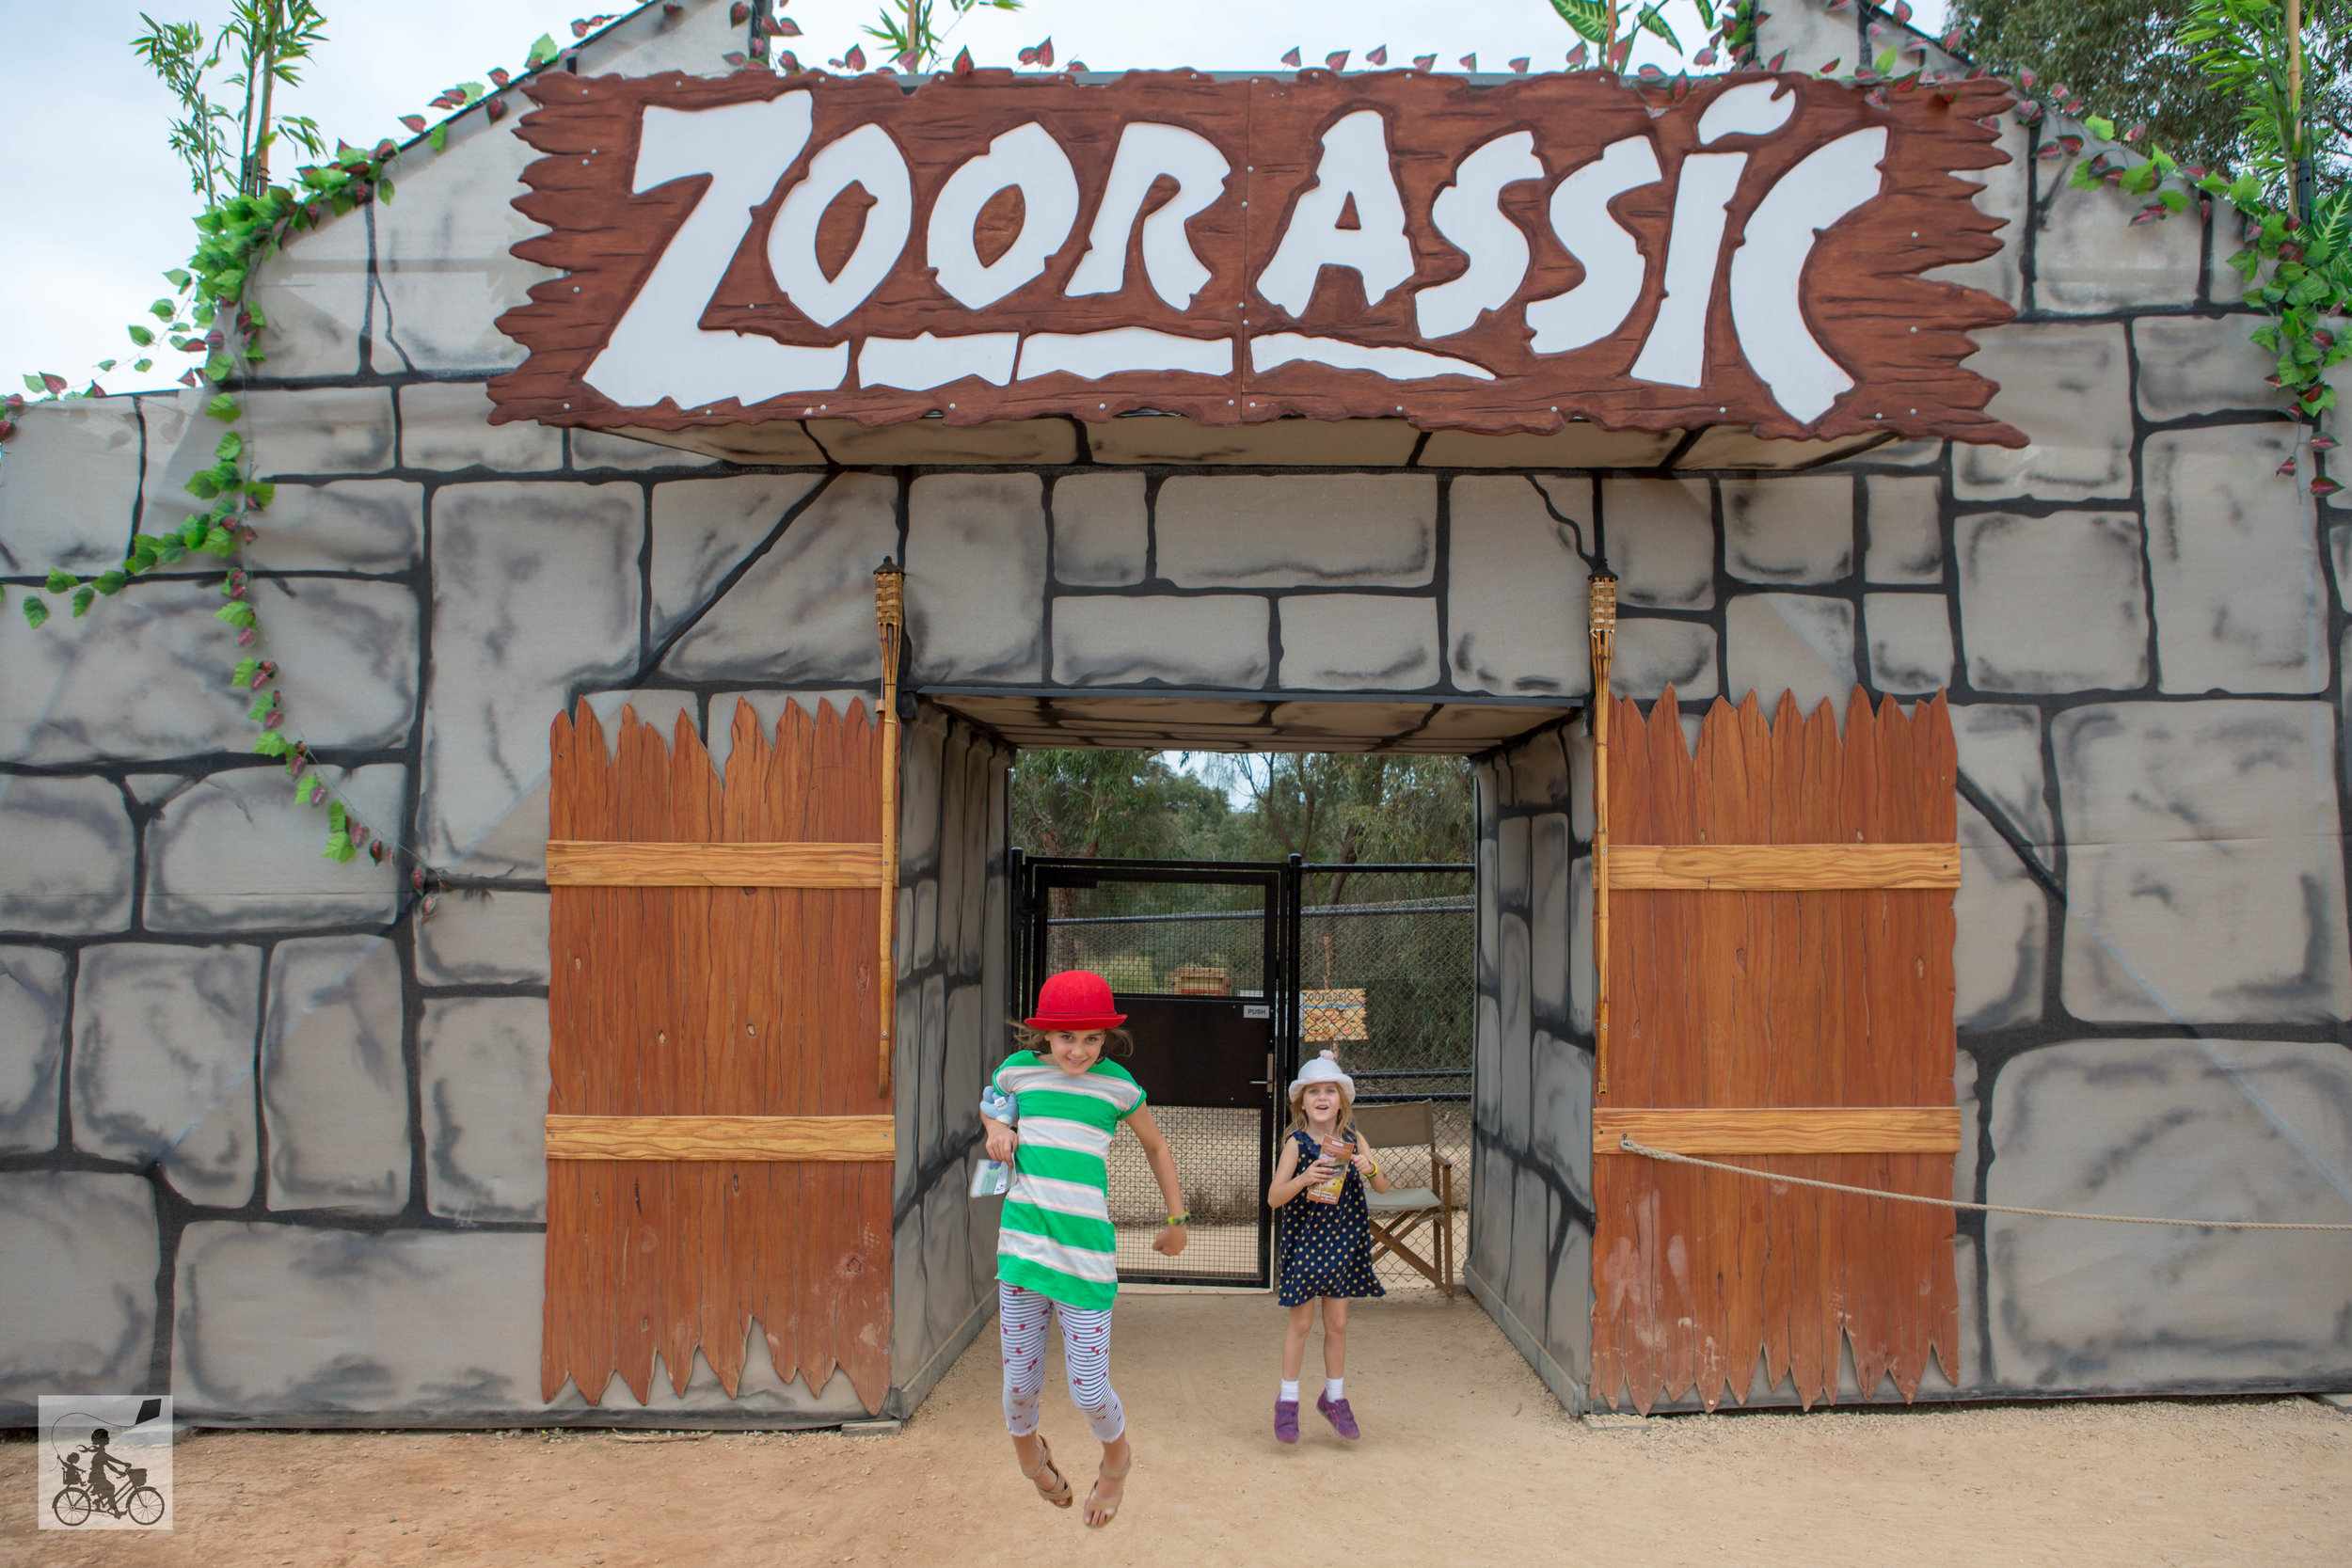 Zoorasic - Mamma Knows West (2 of 5).jpg